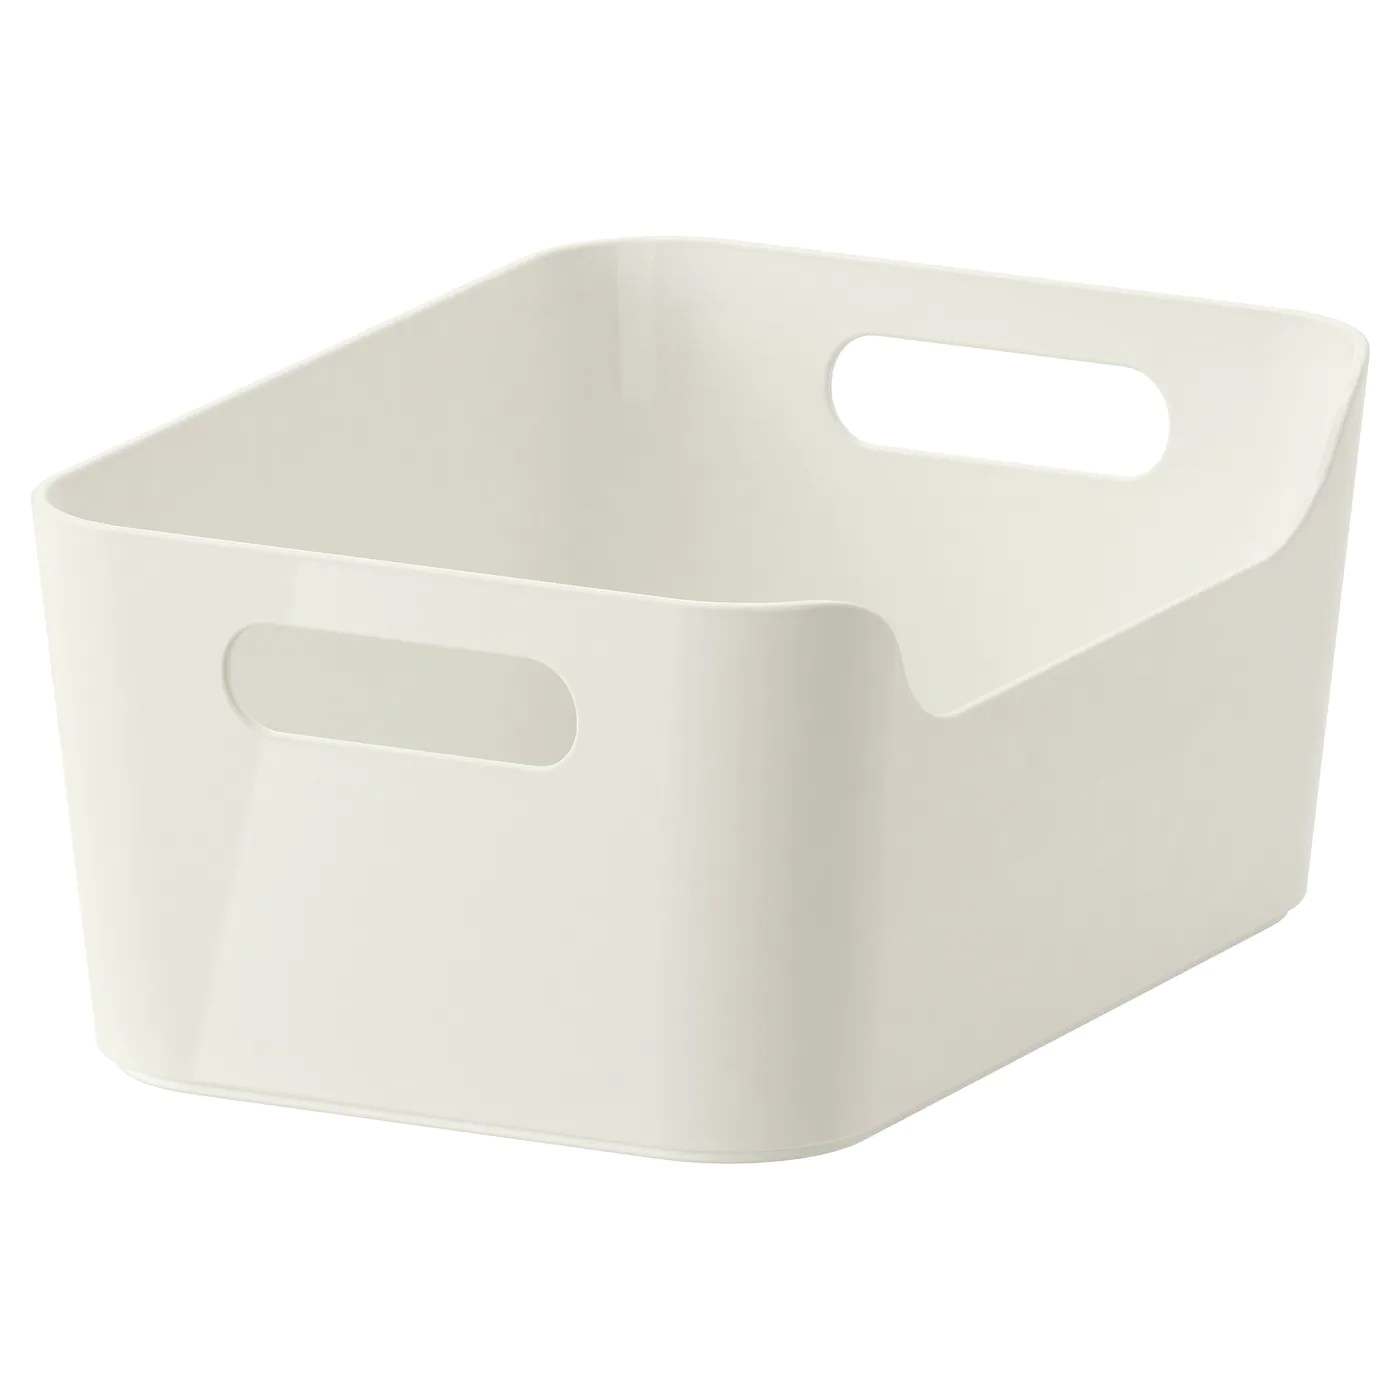 Variera Boite Blanc Brillant 24x17 Cm Ikea